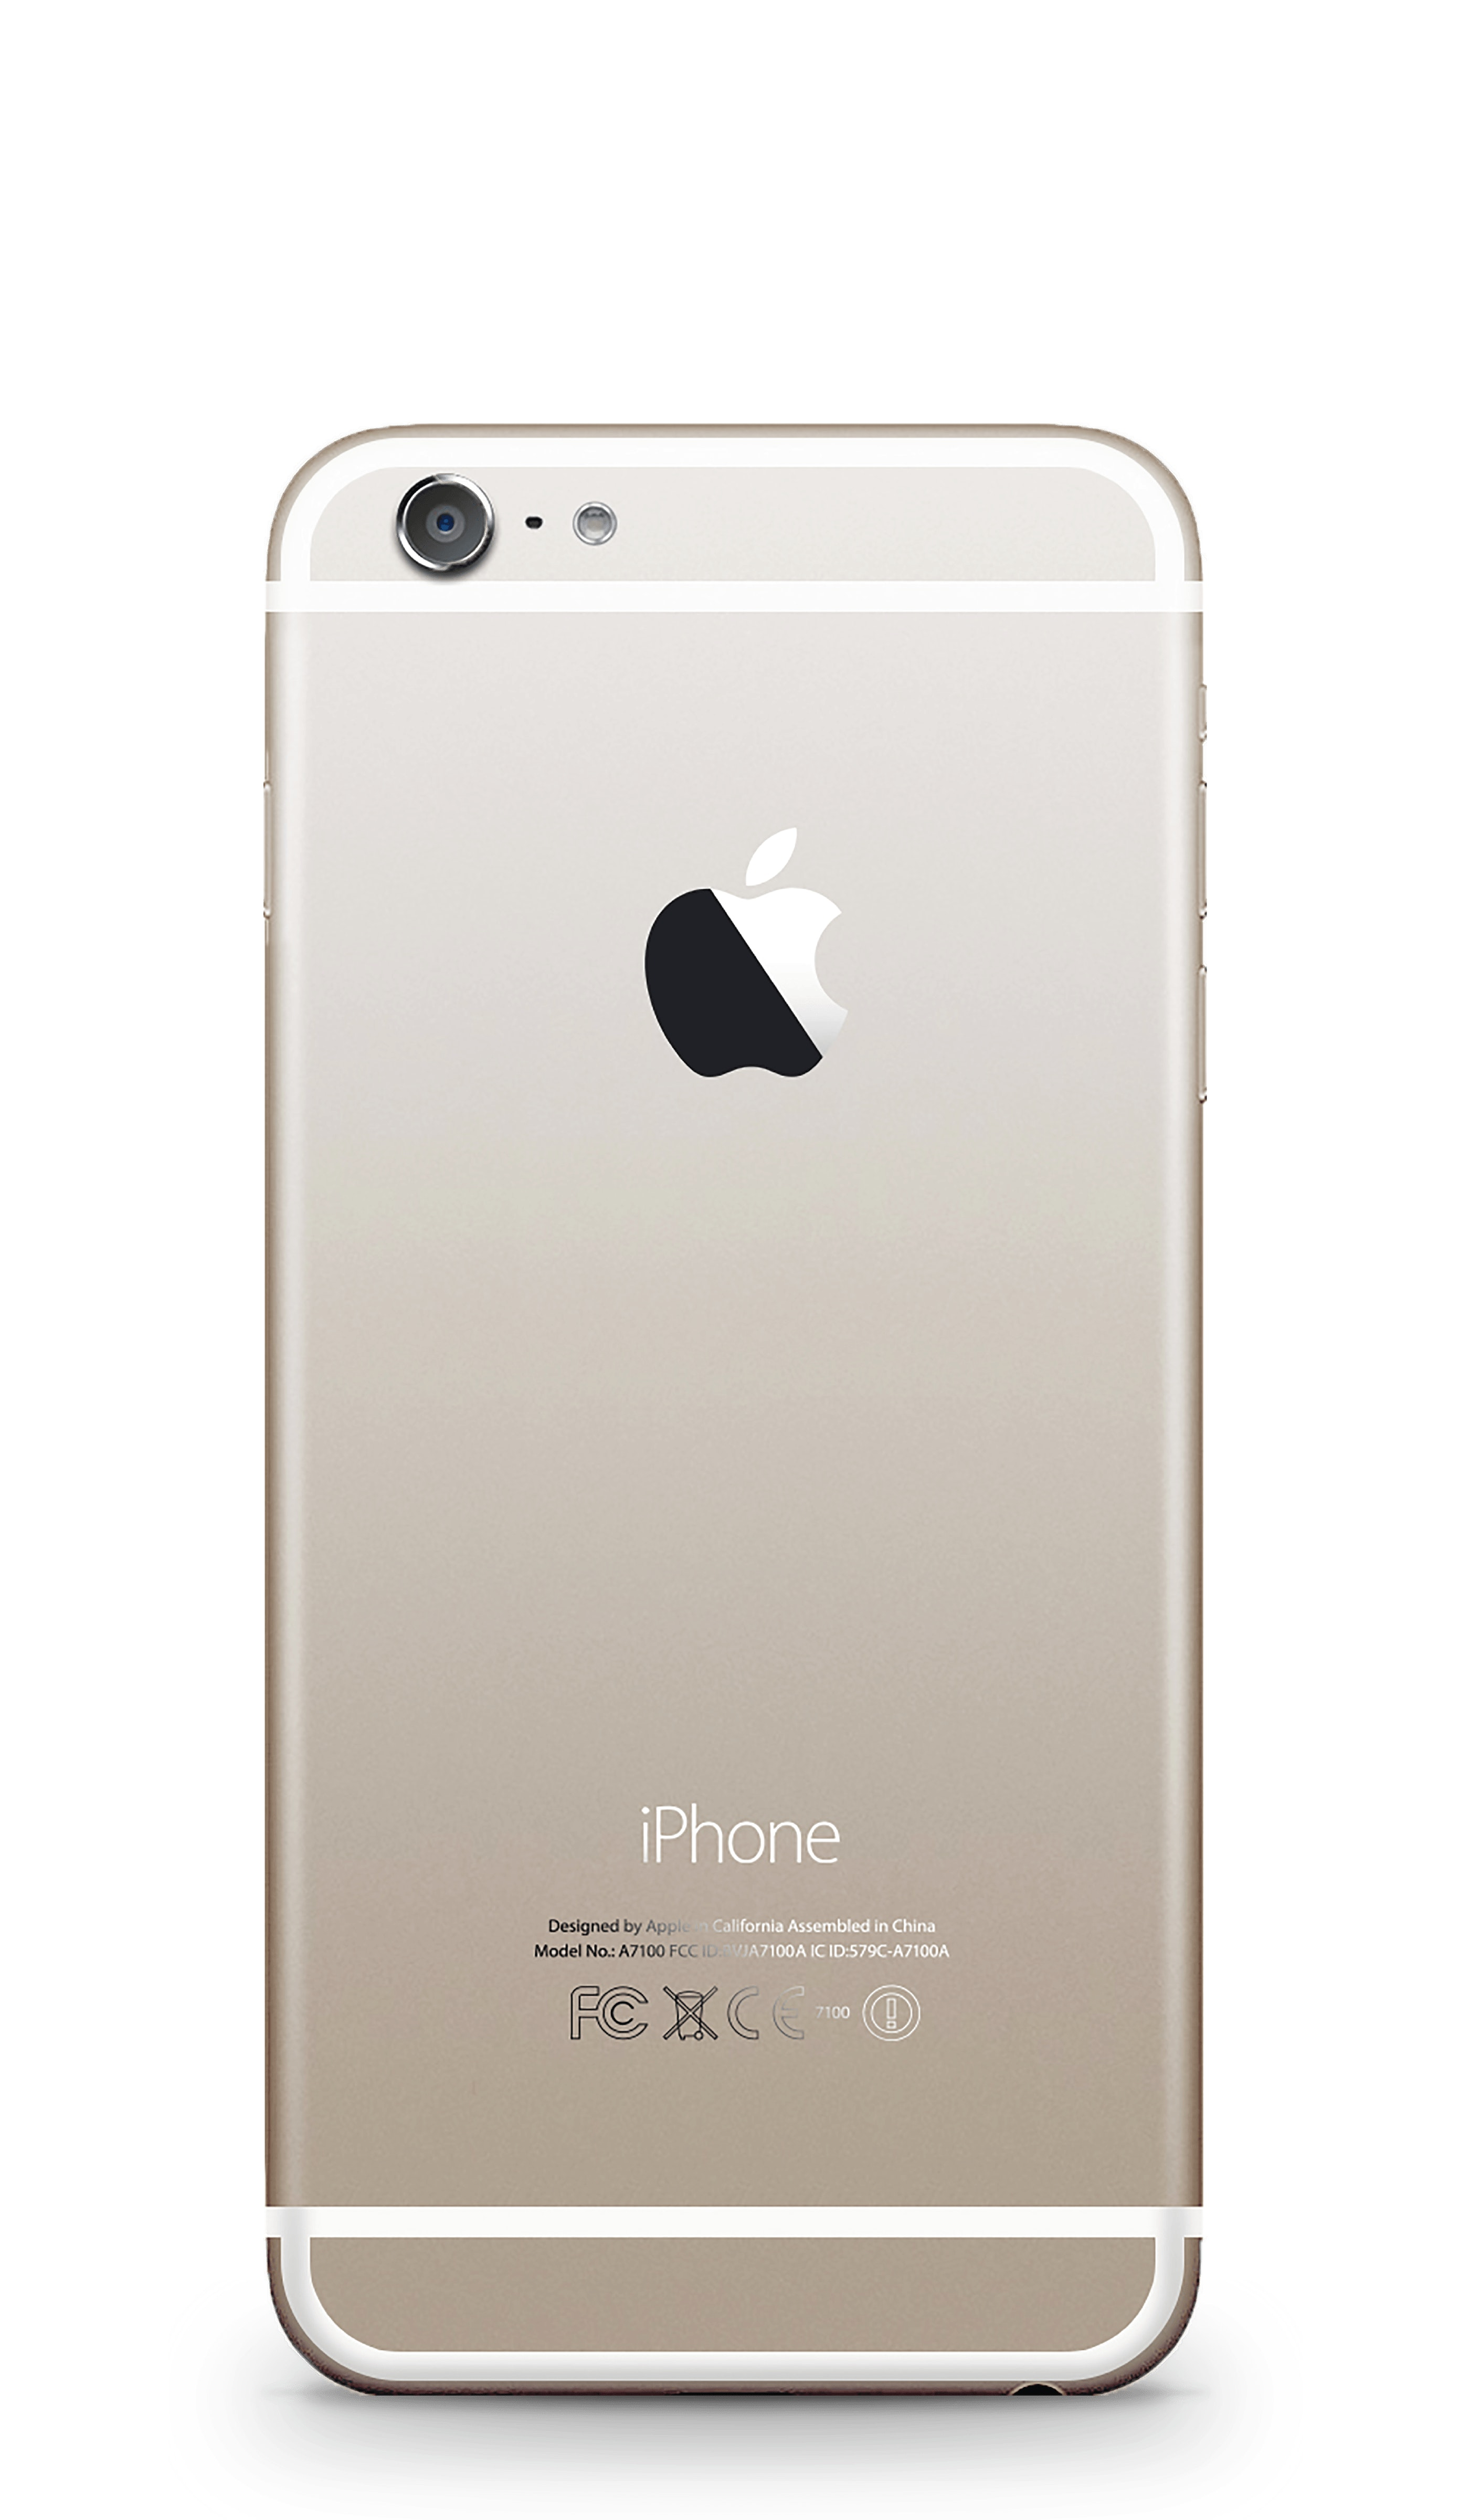 Apple iPhone 6 image